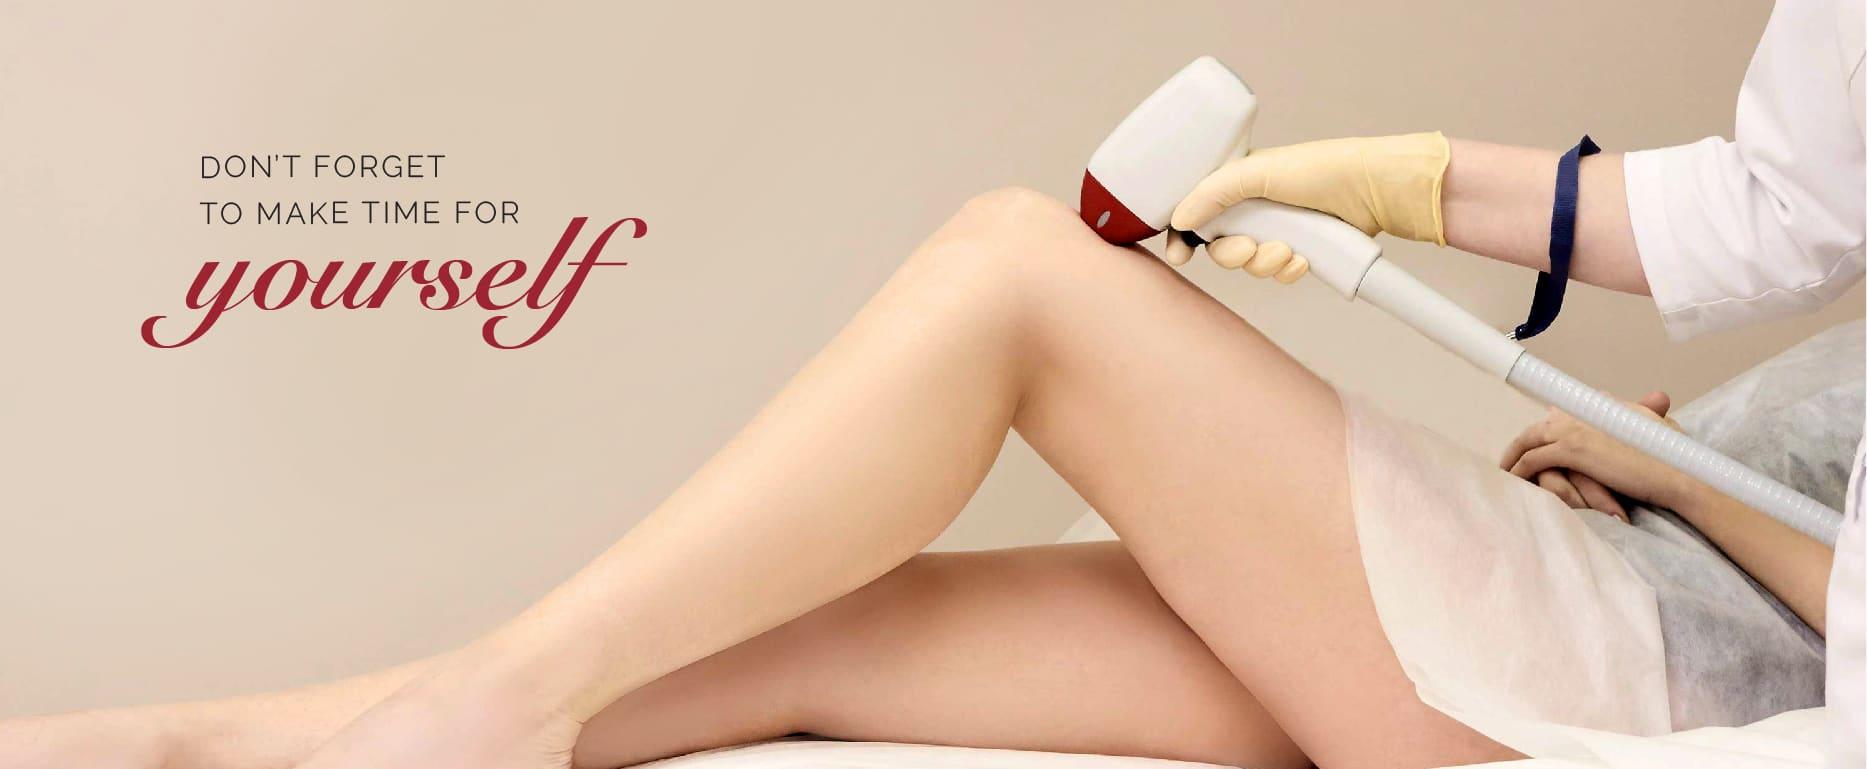 banner body laser treatment